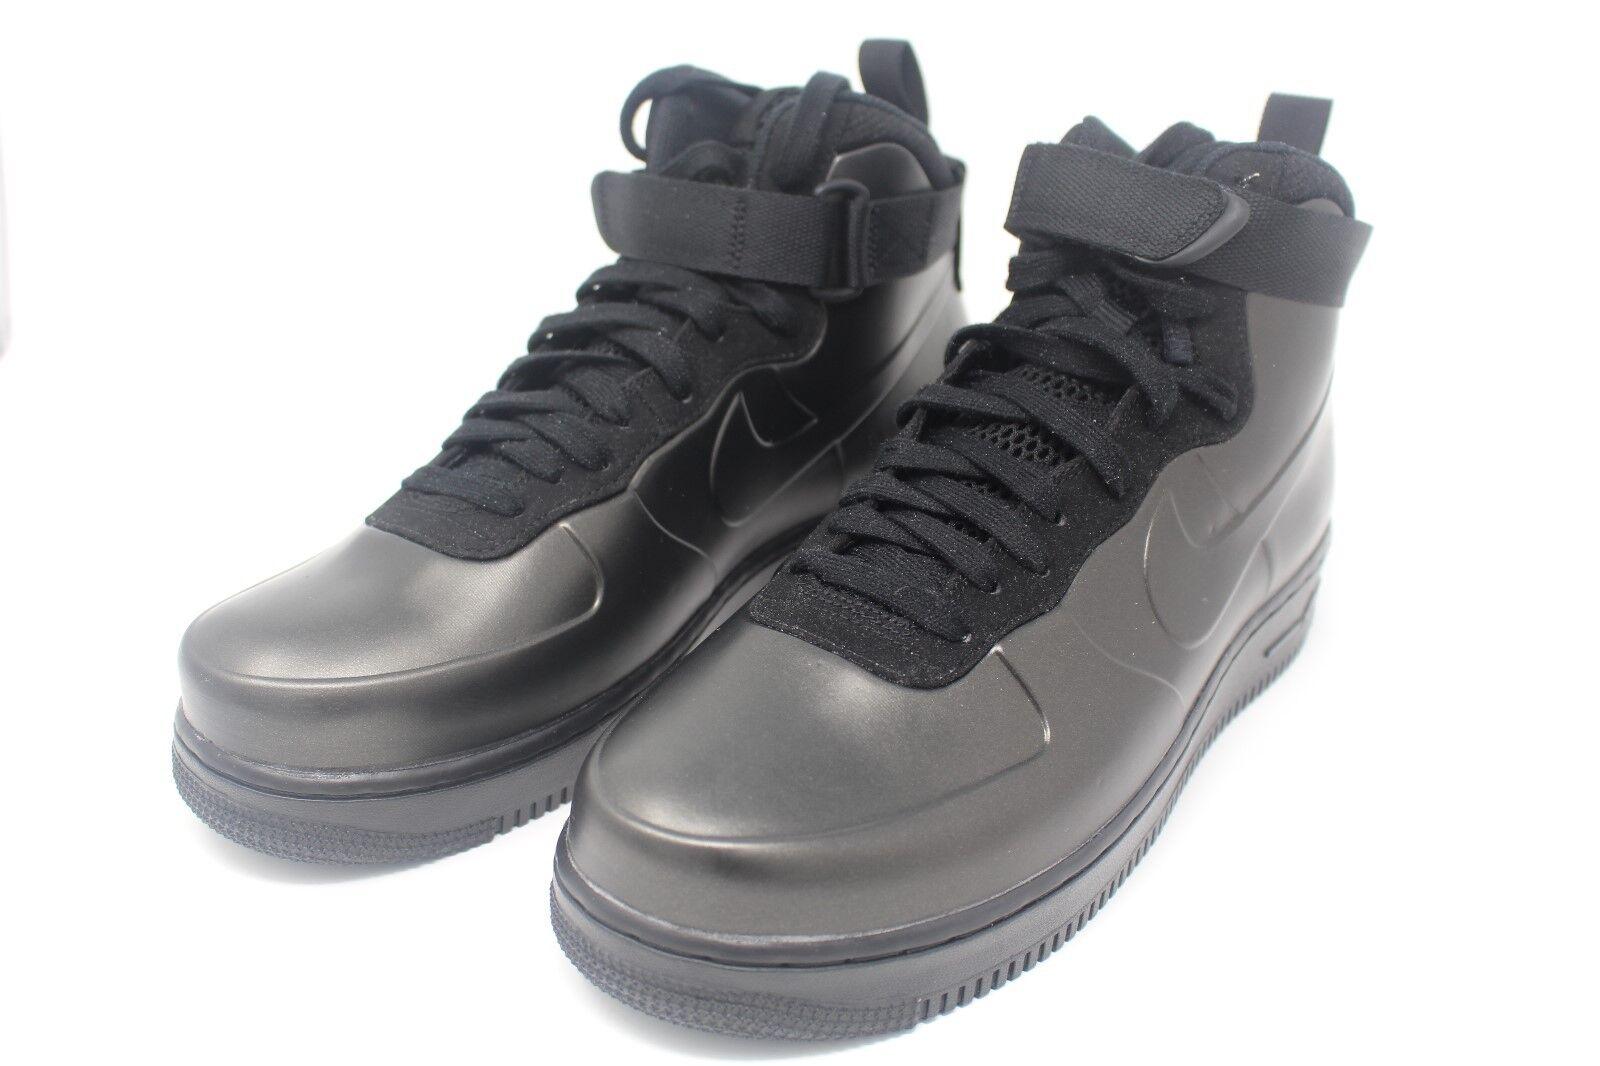 Nike Air Force 1 Foamposite Cup Black Black AH6771-001 Size 9